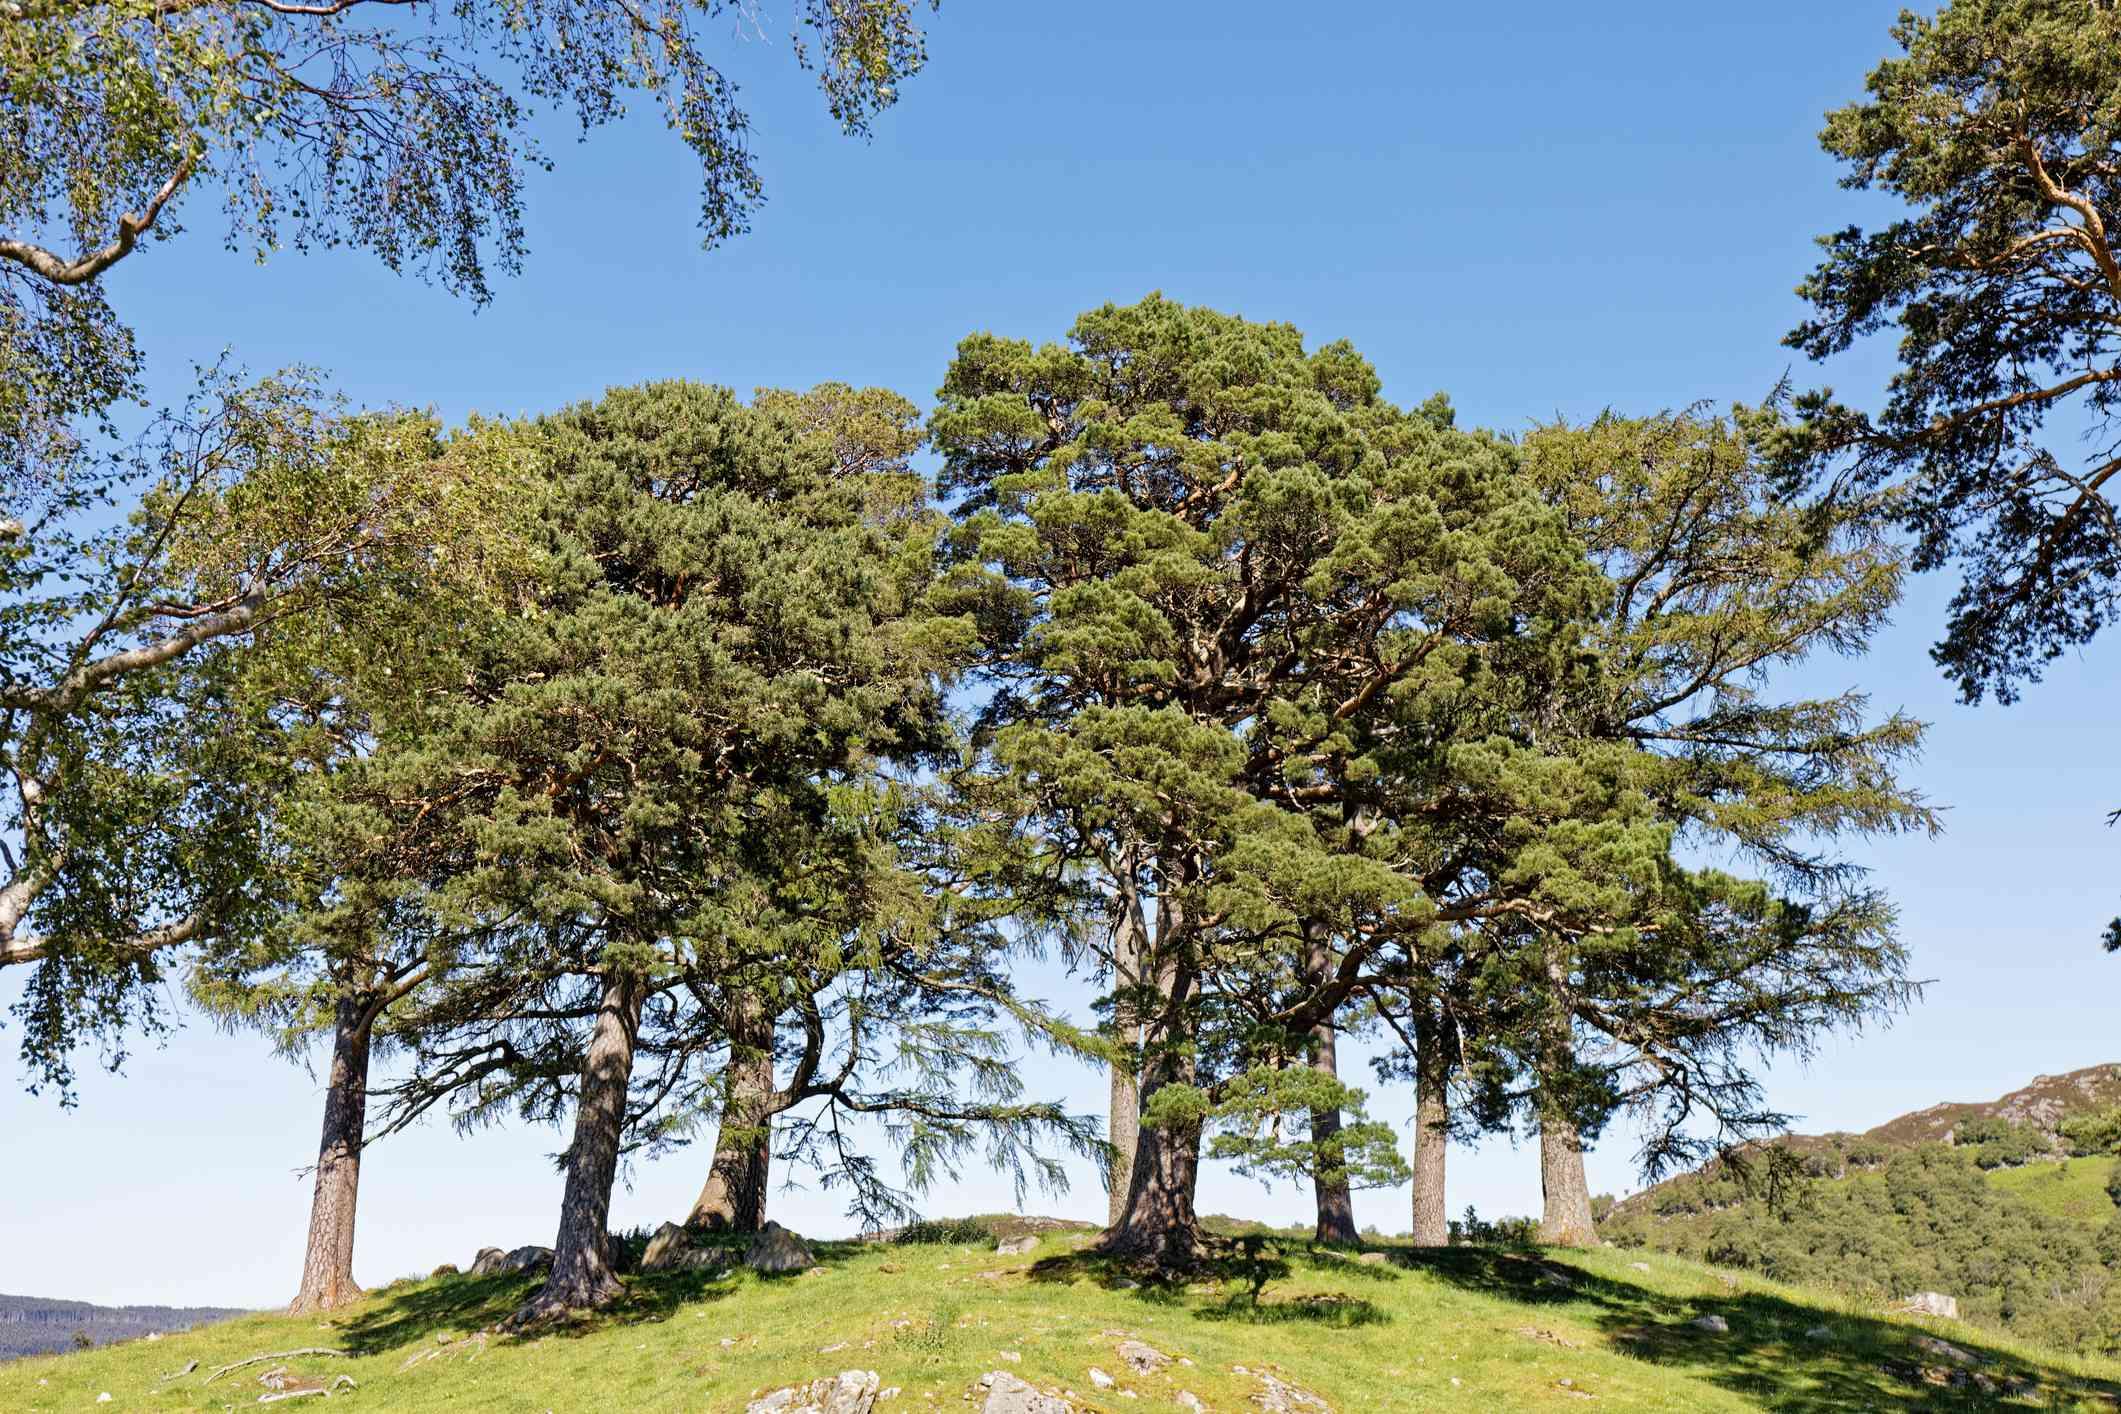 The hilltop for Craigh na Dun near Kinloch Rannoch, Scotland